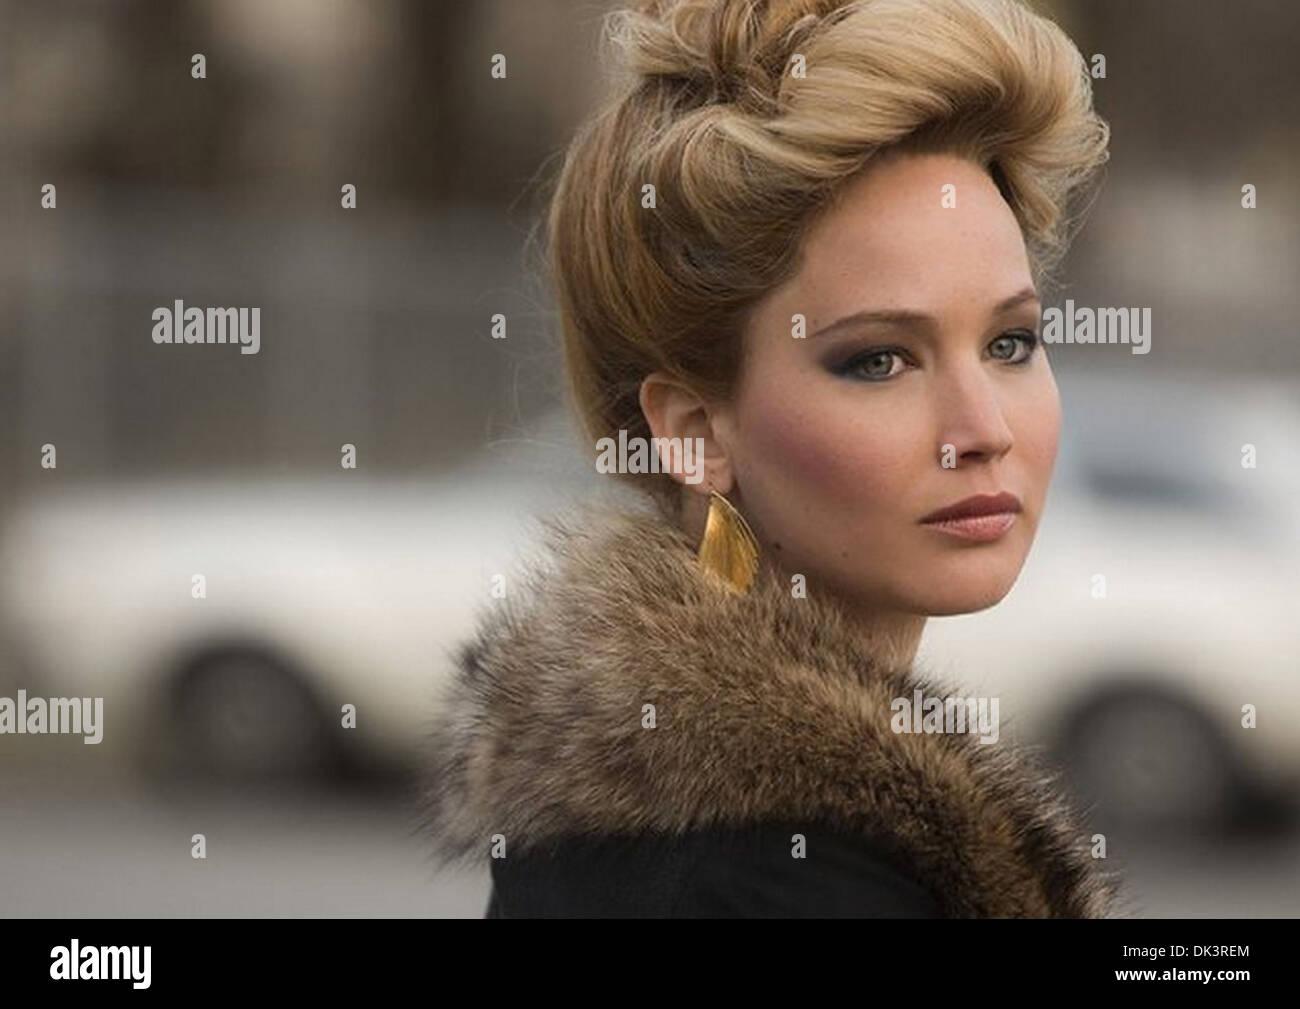 JENNIFER LAWRENCE Actress PHOTO Print POSTER Movie X-Men American Hustle Joy 001